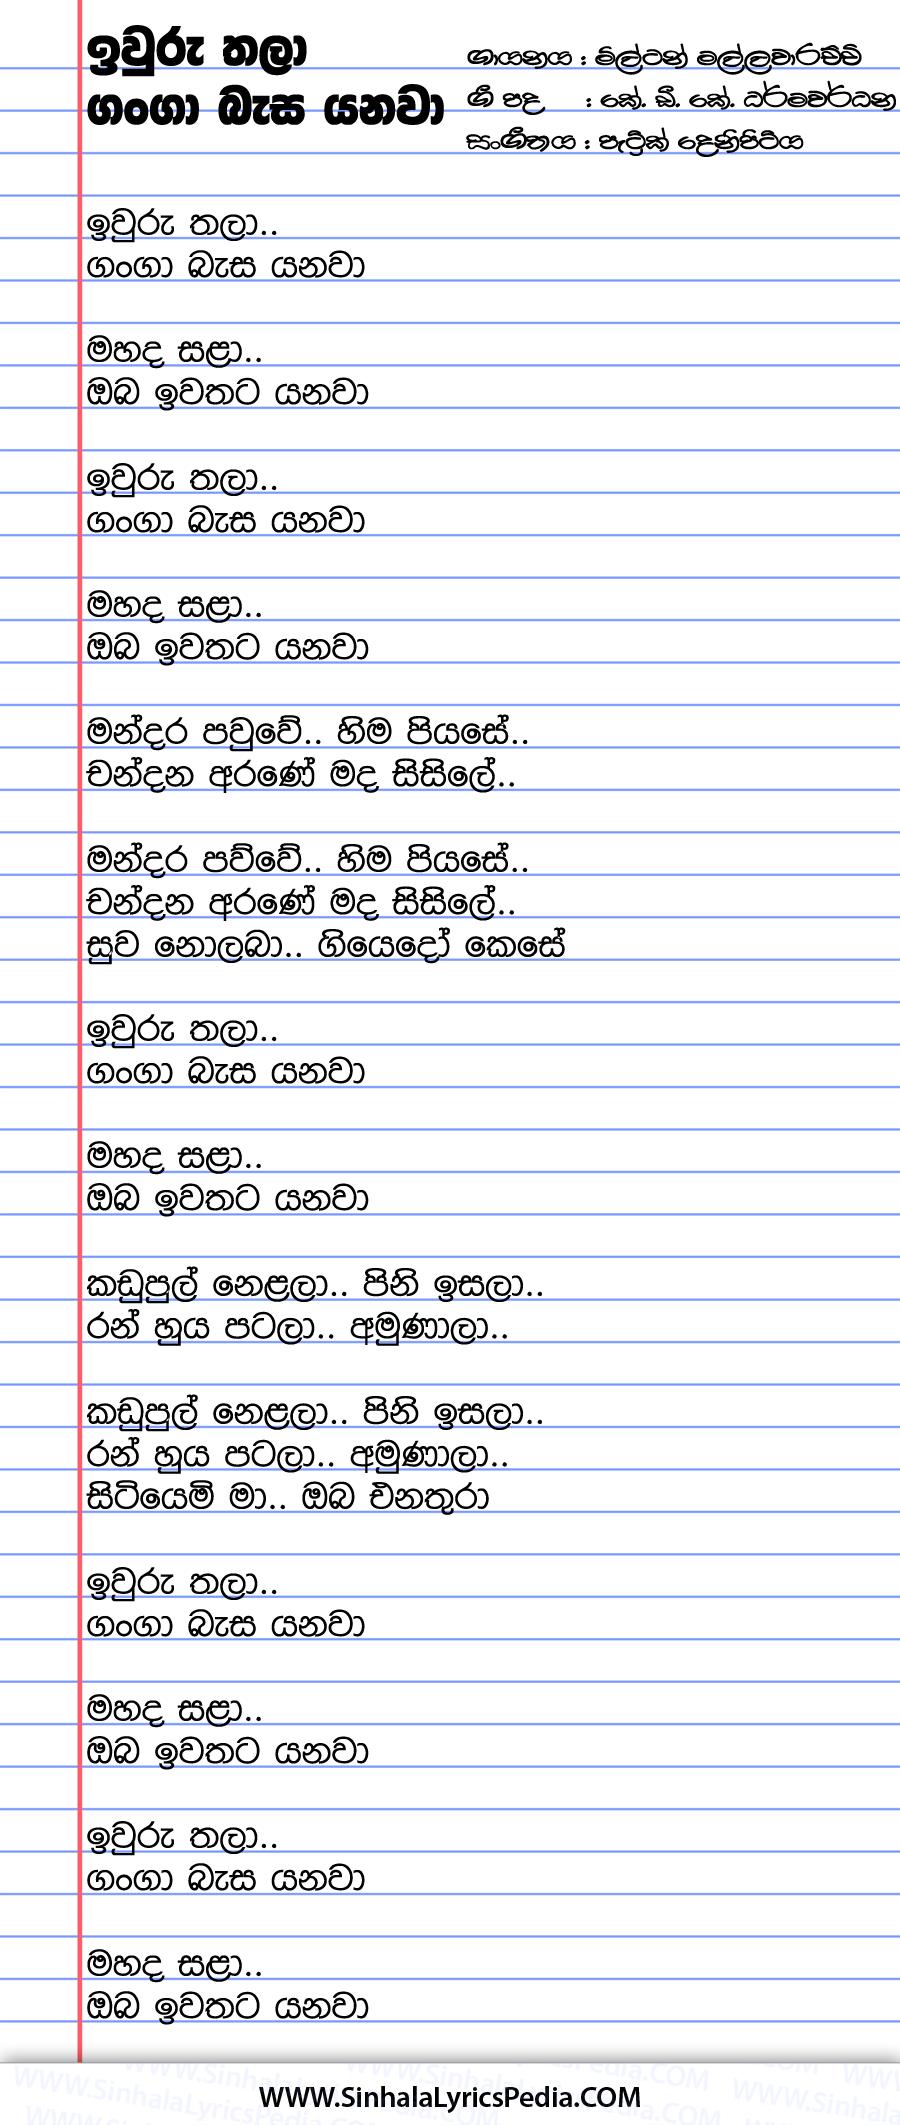 Iwuru Thala Ganga Basa Yanawa Song Lyrics